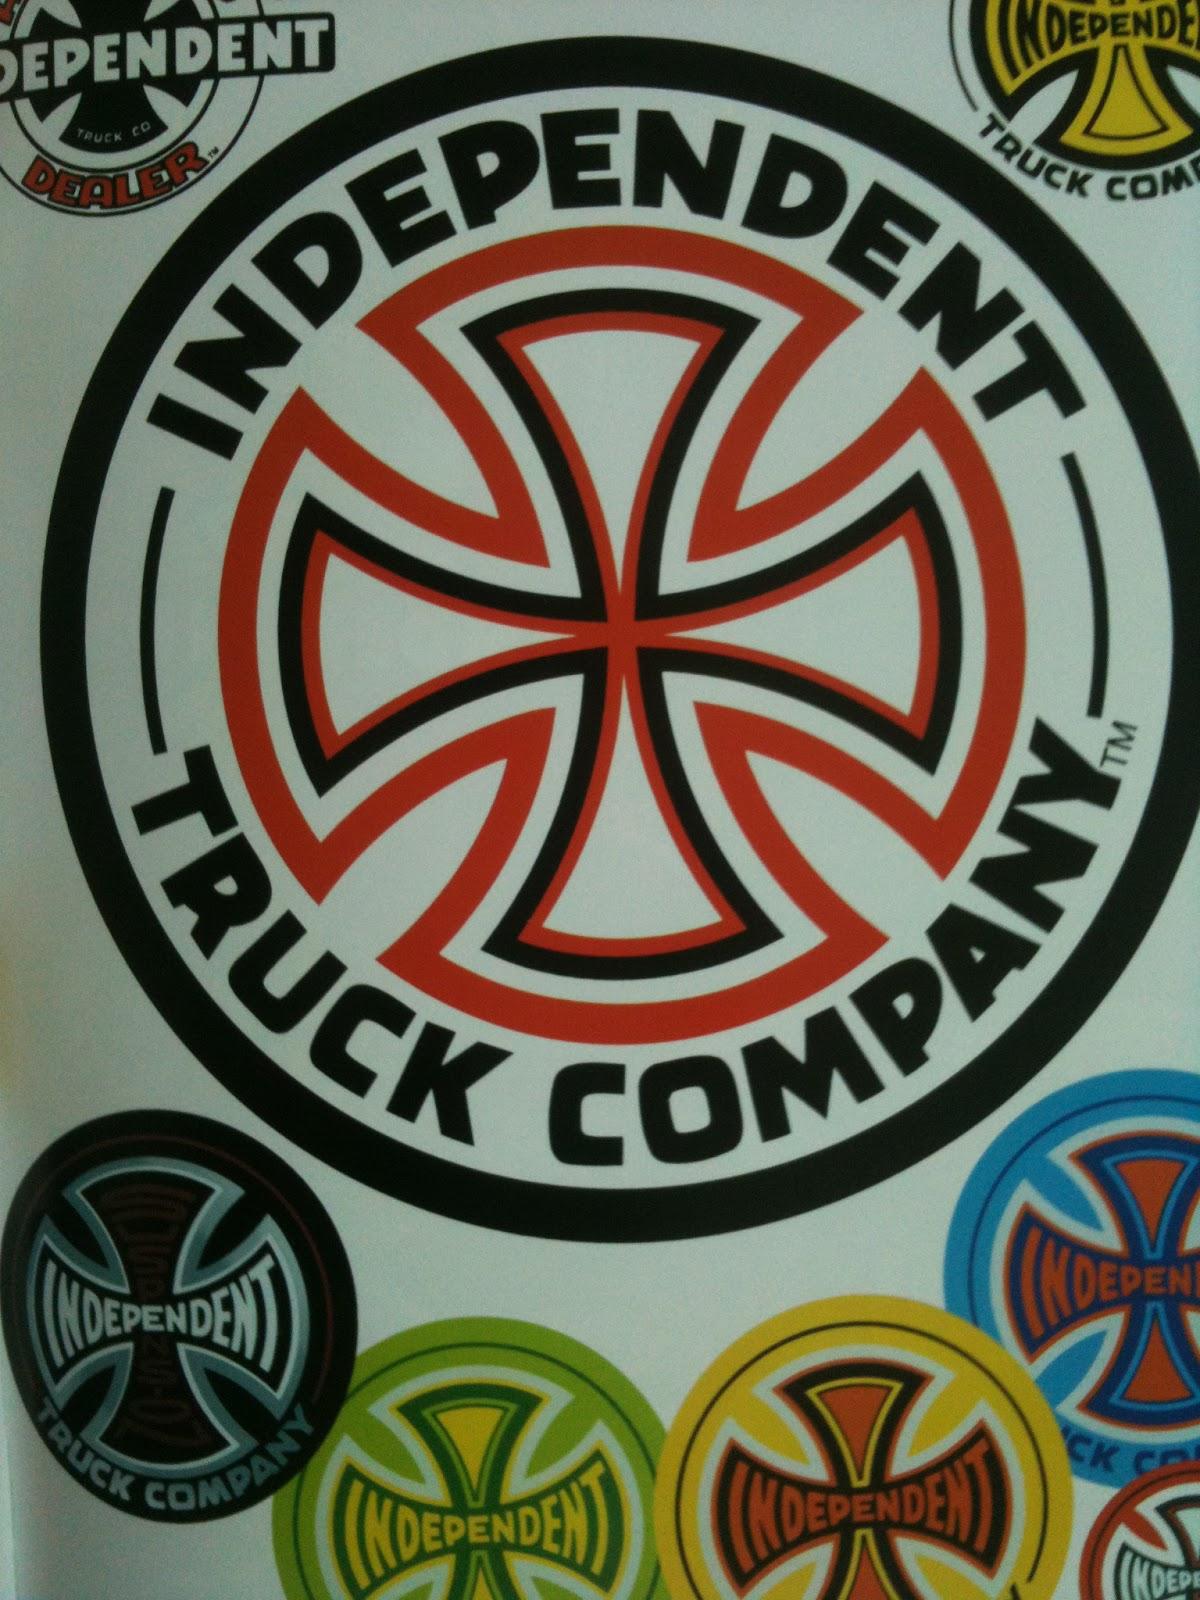 scribble junkies creation of the independent trucks logo rh scribblejunkies blogspot com independent trucks logo nazi independent trucks logo meaning